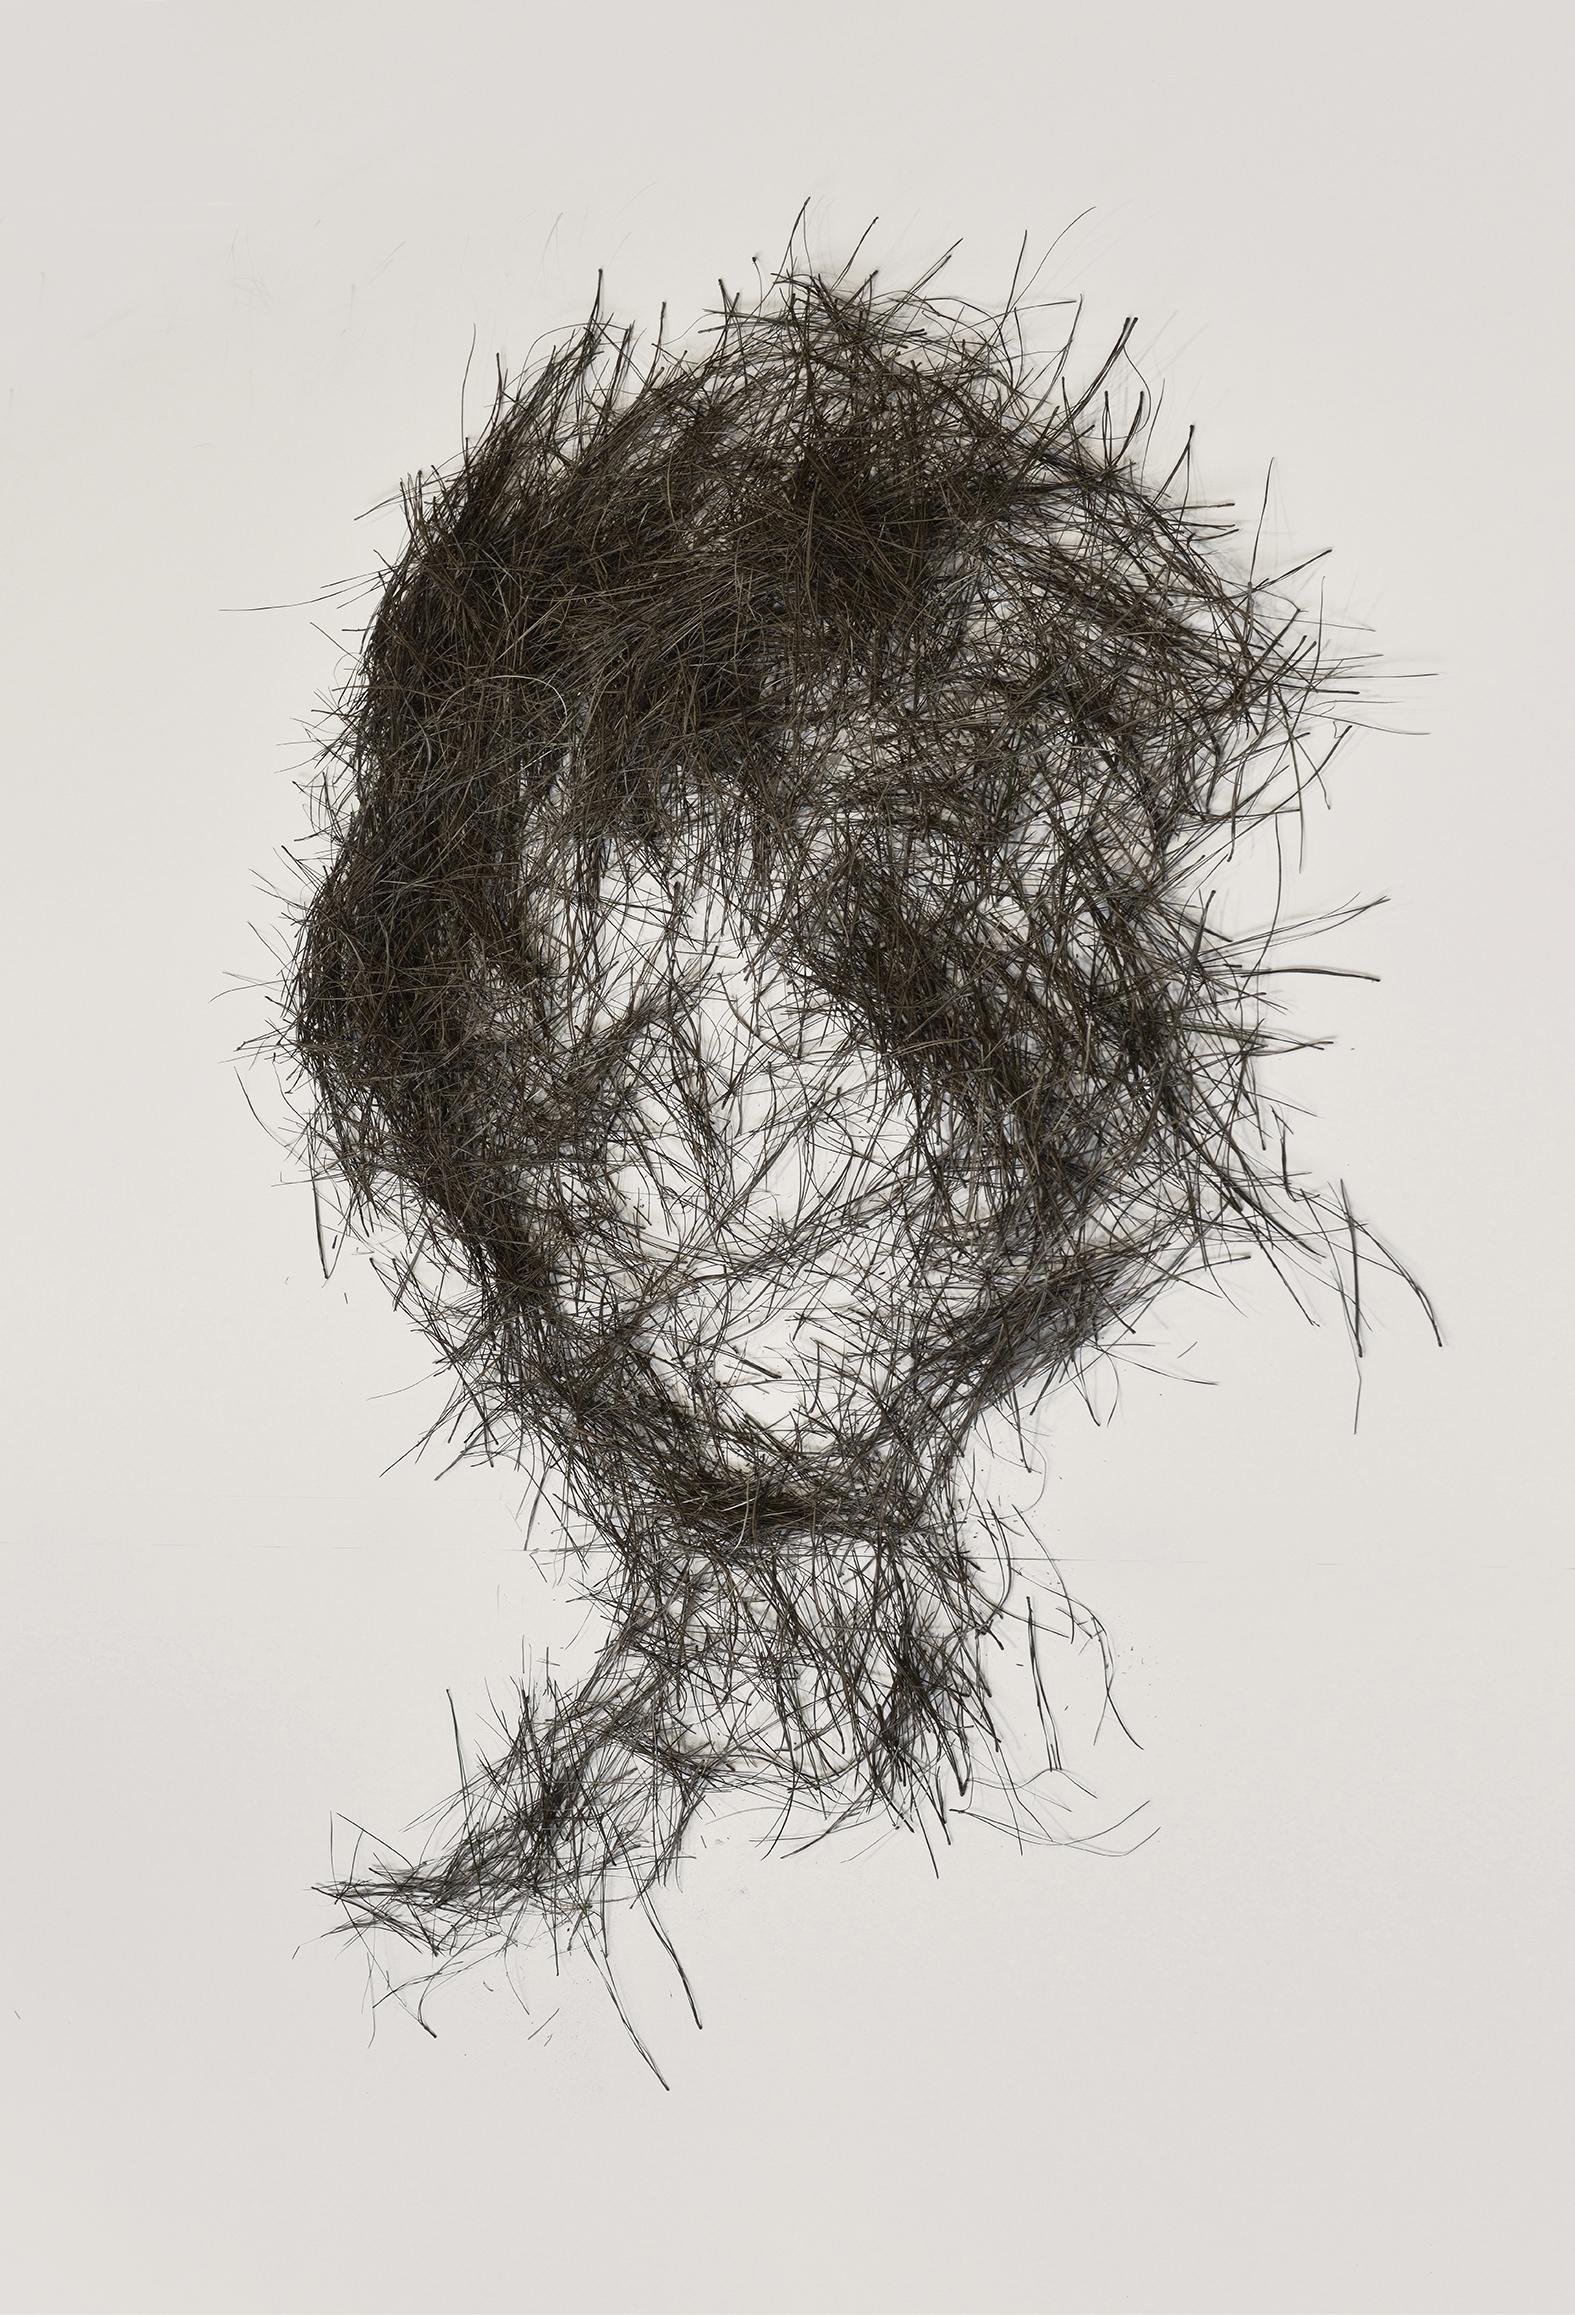 Innocent head, pine needle drawing, 2015. Digital print on paper.